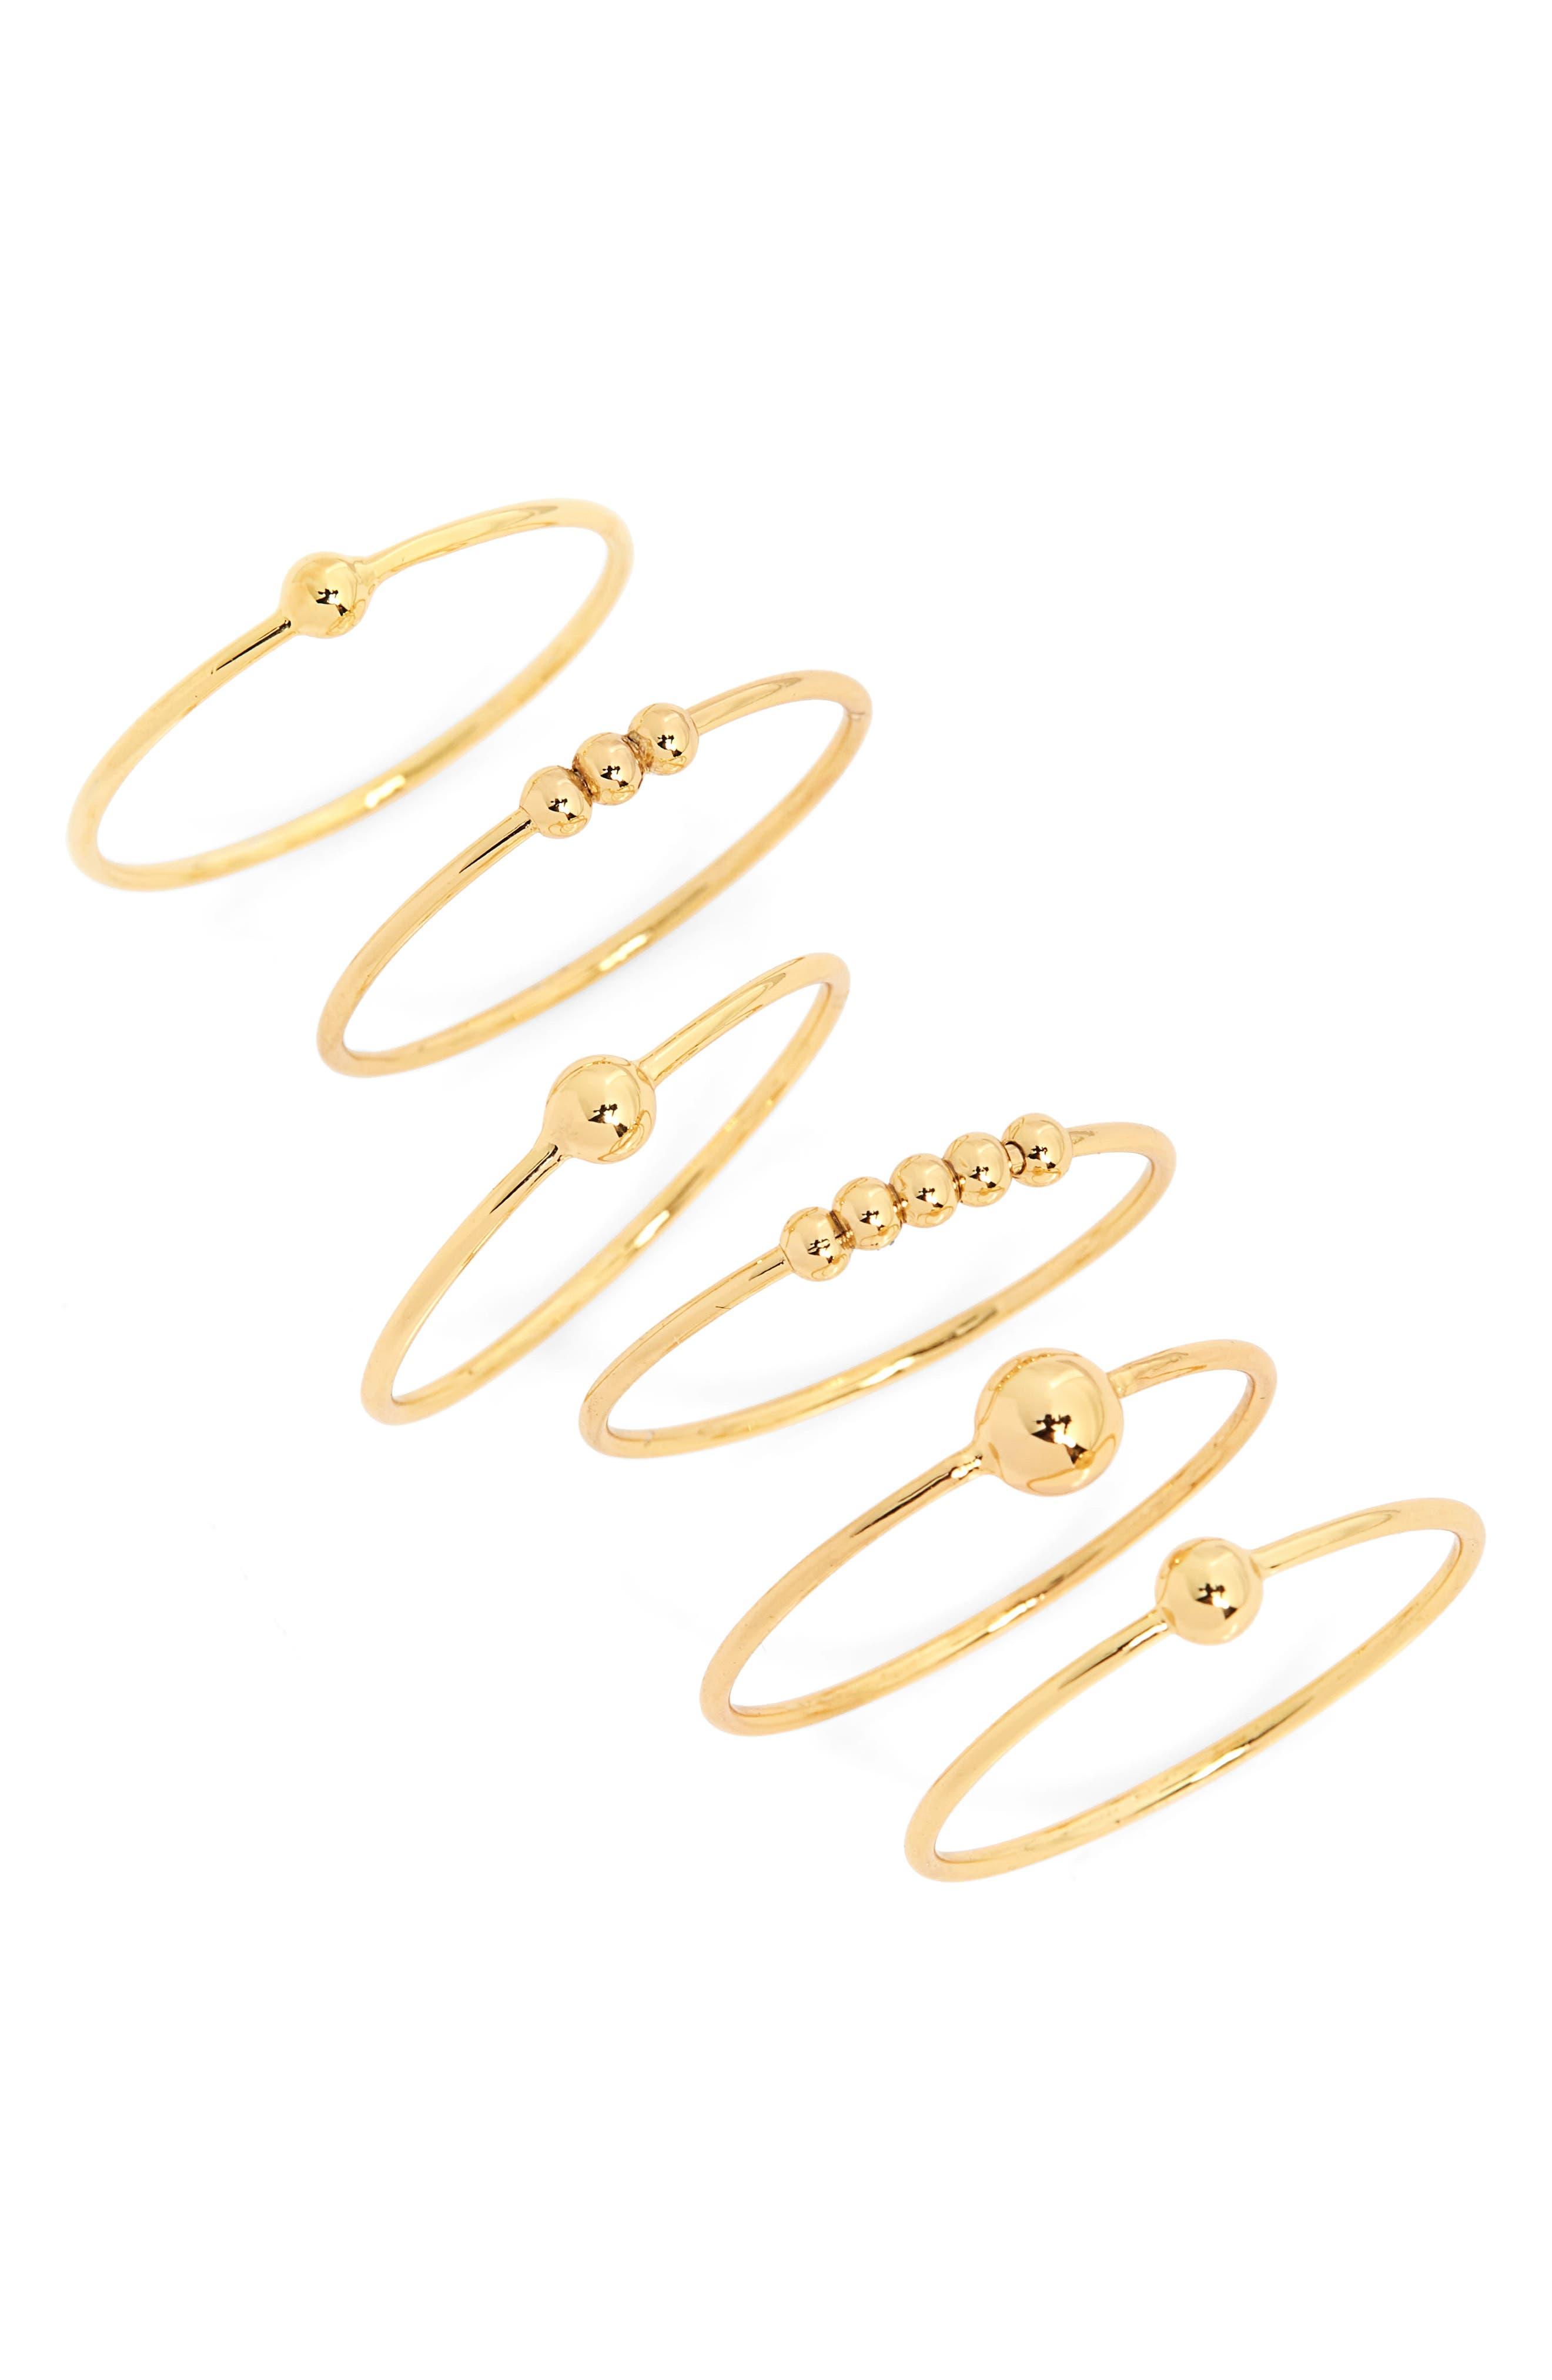 Newport Set of 6 Mixed Stacking Rings,                         Main,                         color, GOLD